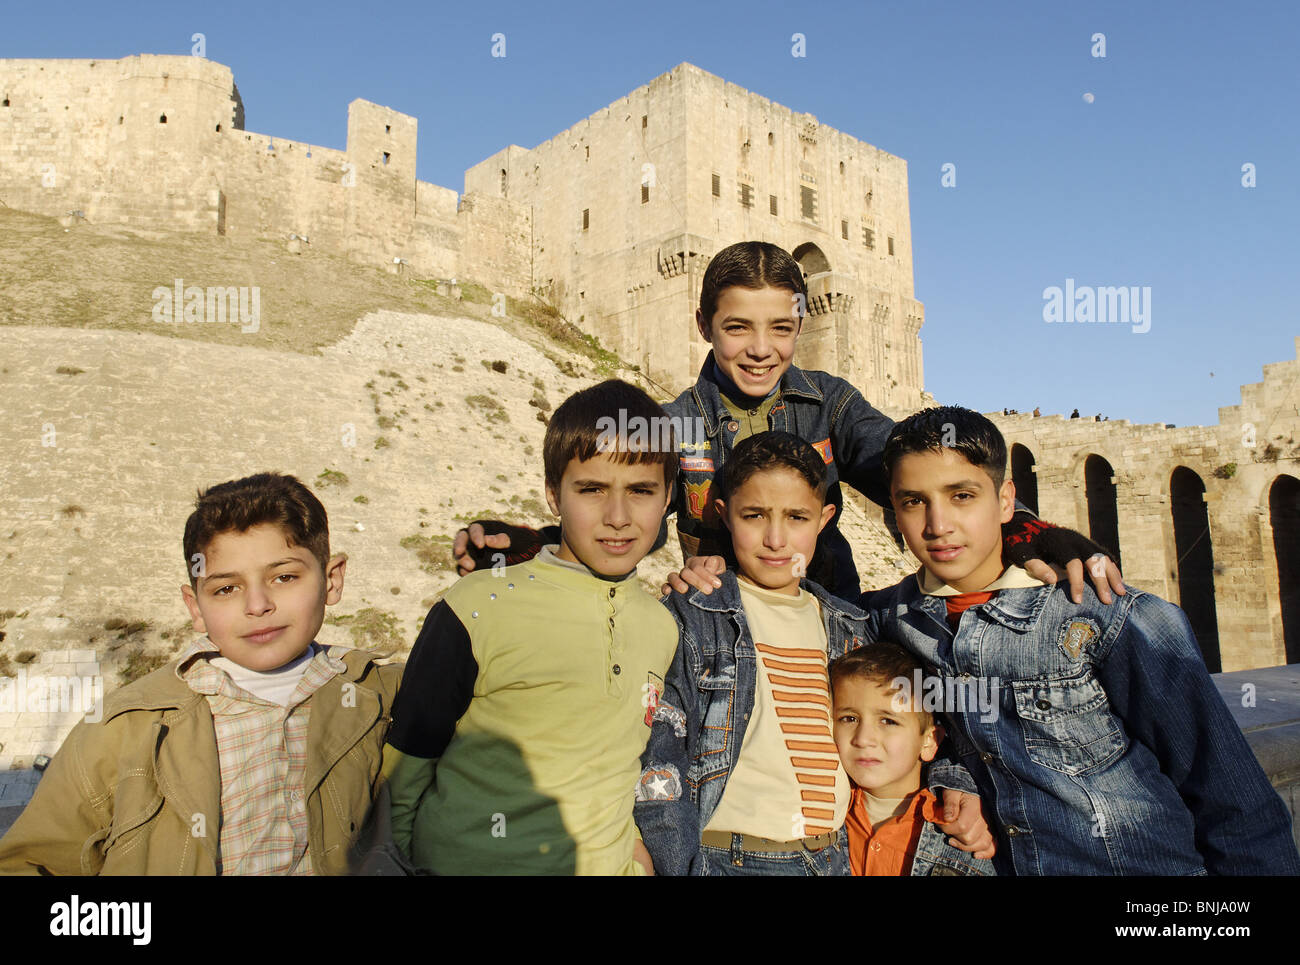 Arab friendship site